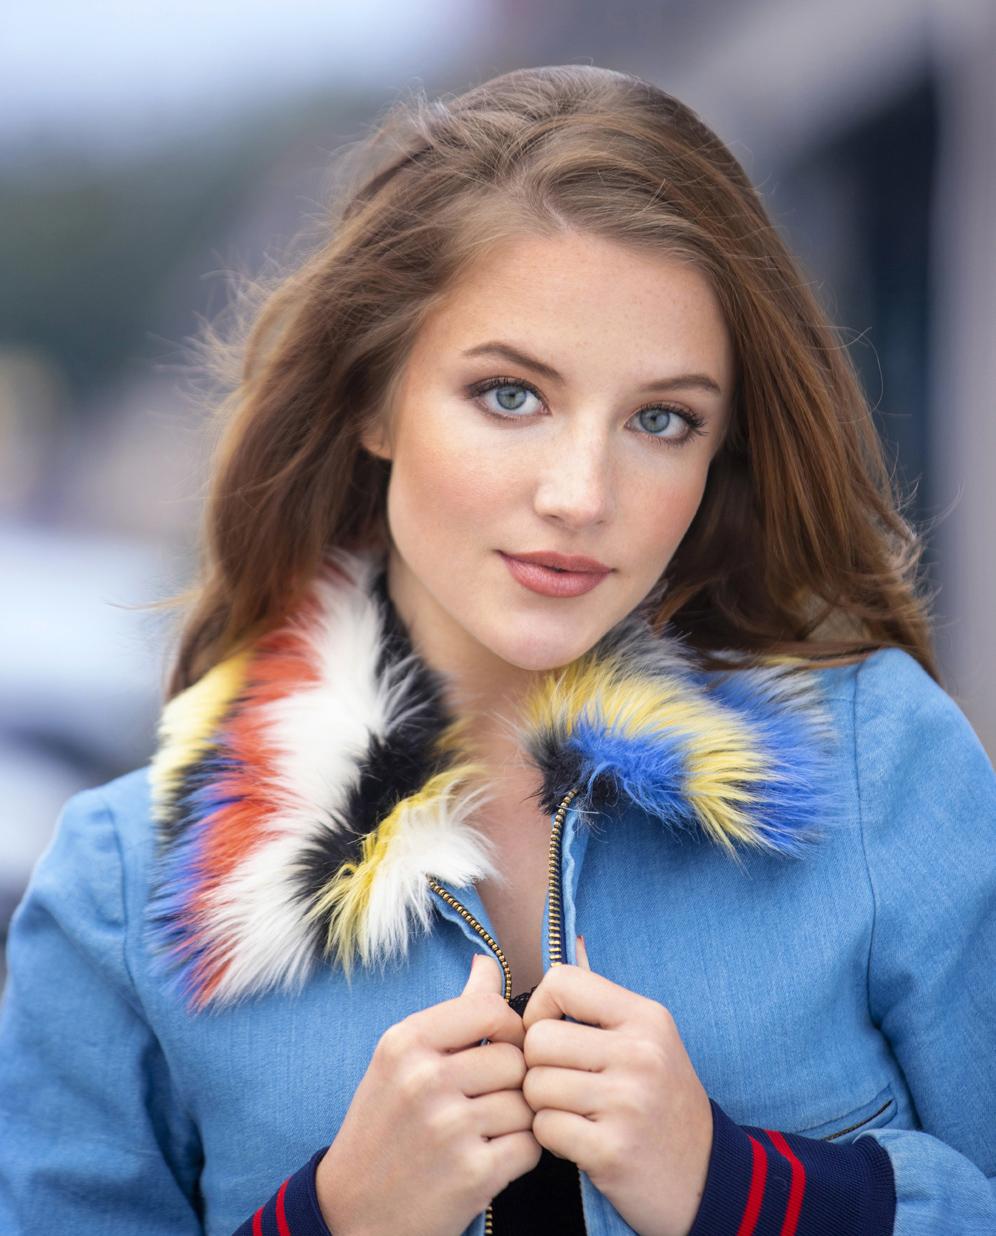 Tulsa Actress Headshots